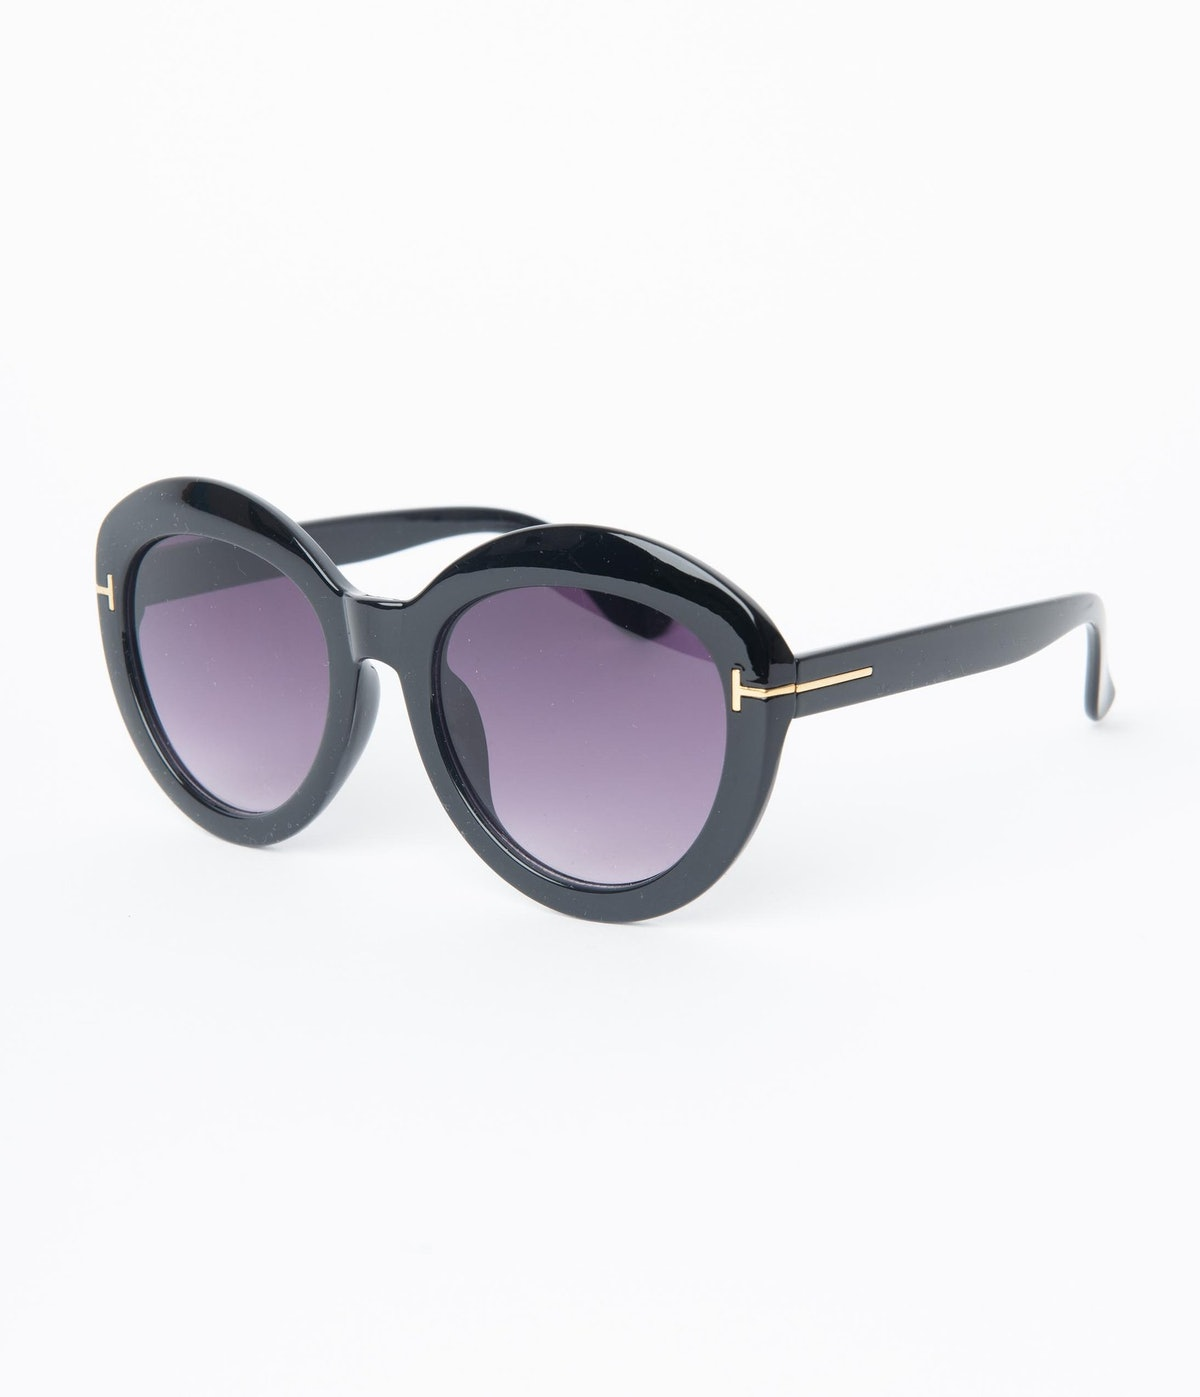 Black Retro Rounded Sunglasses